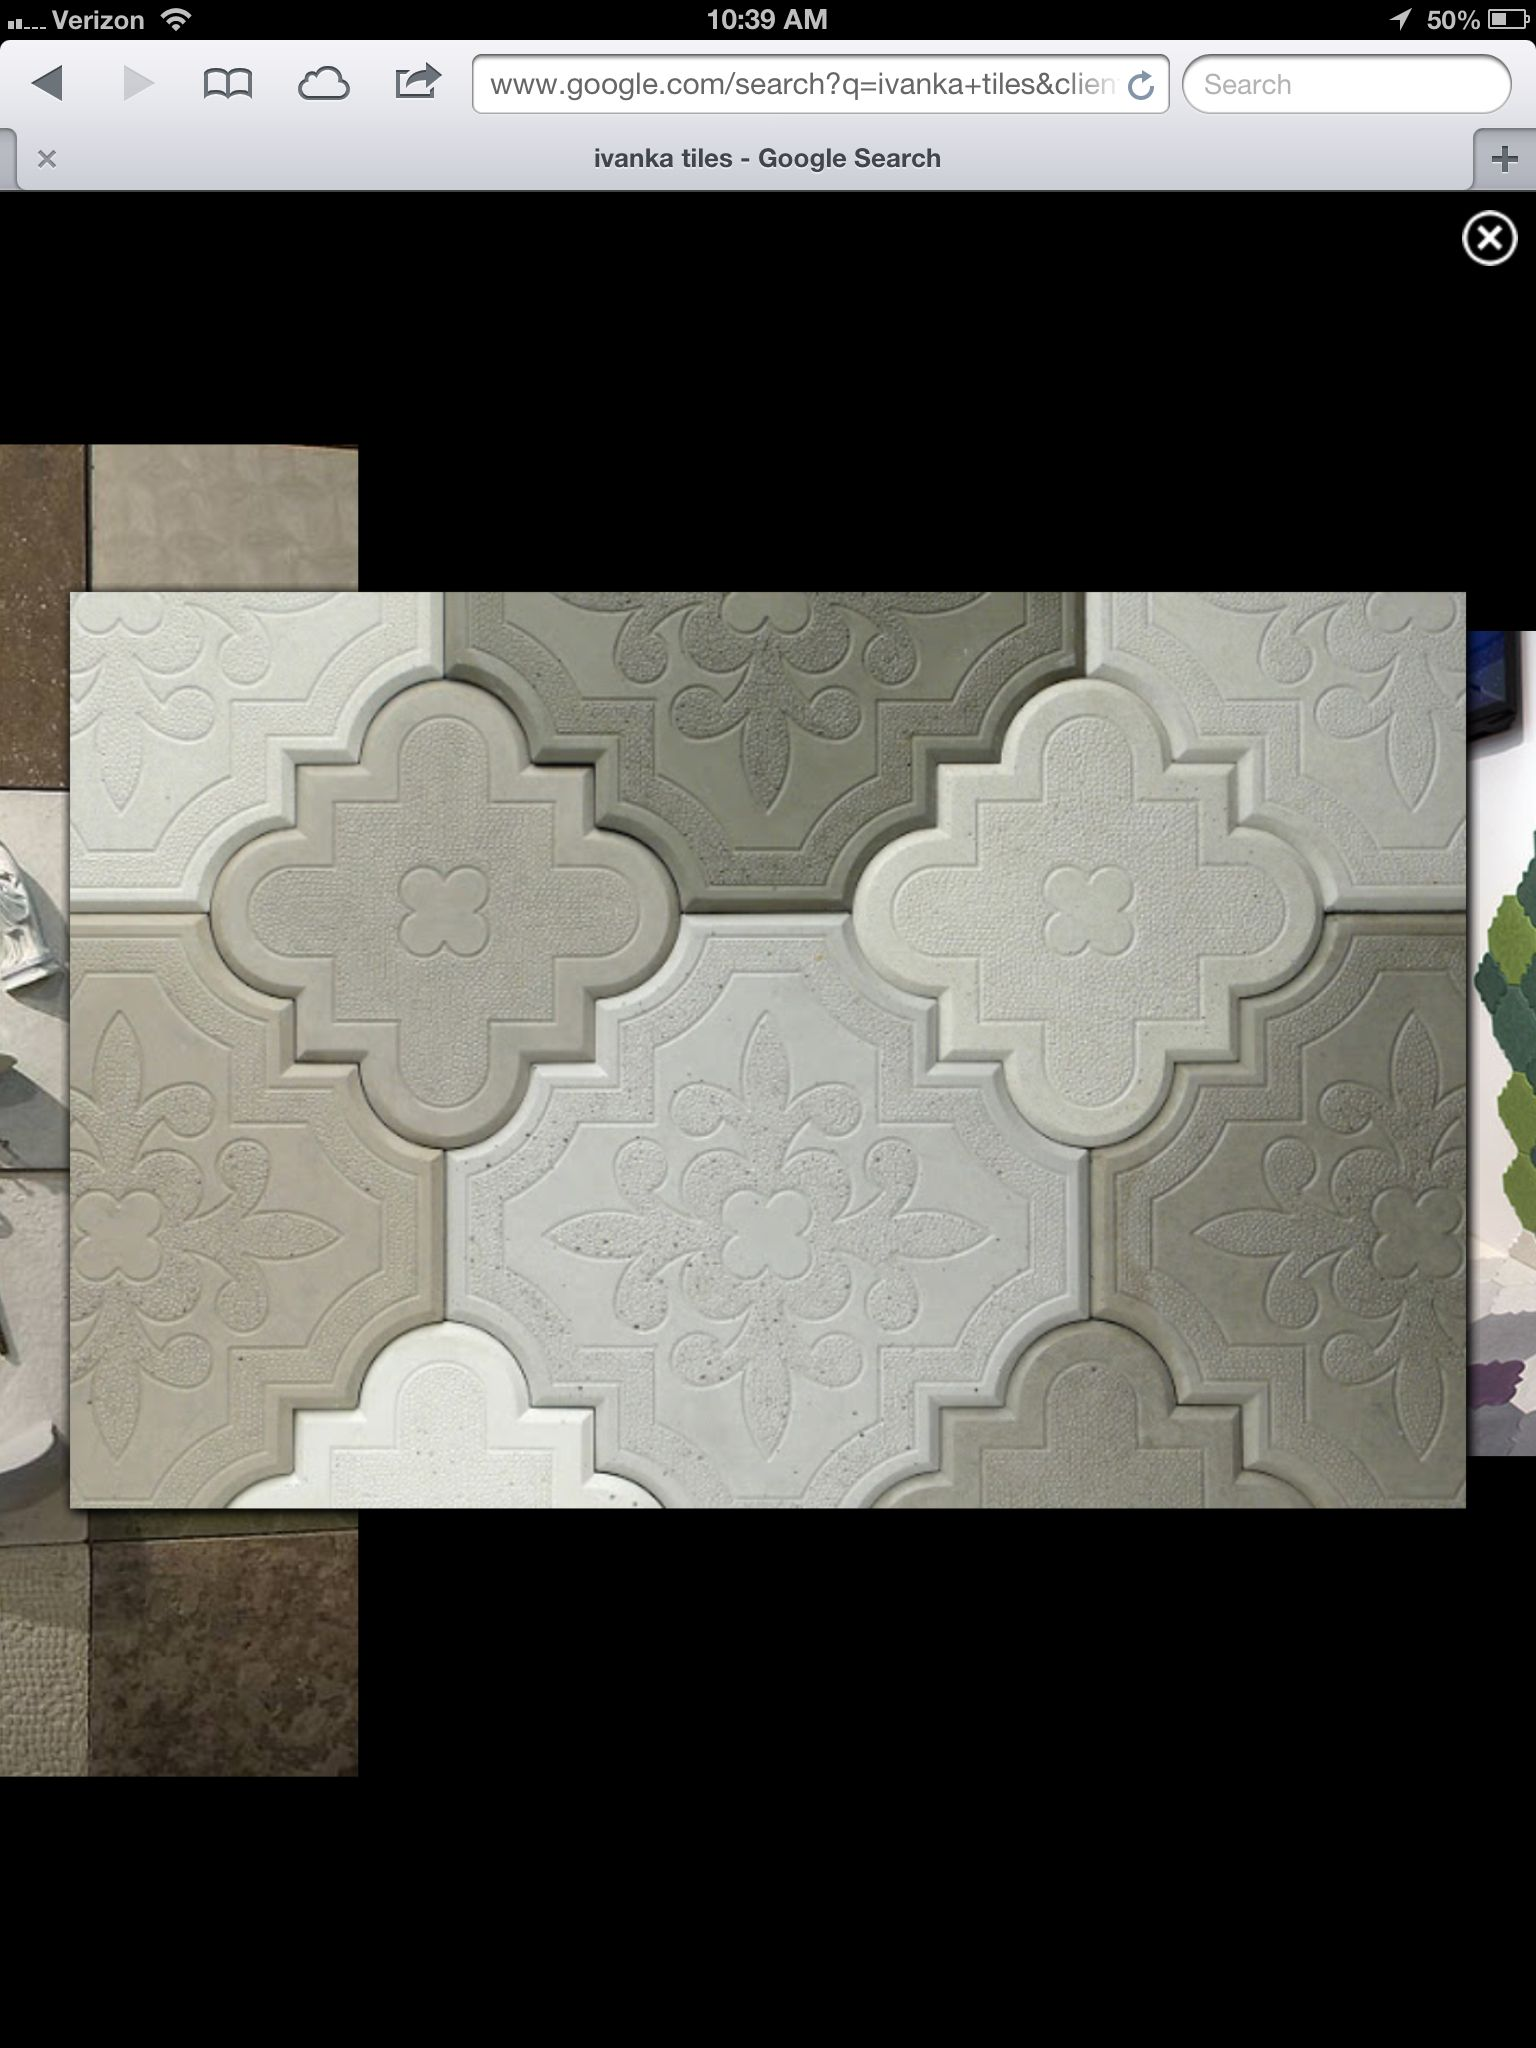 Awesome concrete tile!